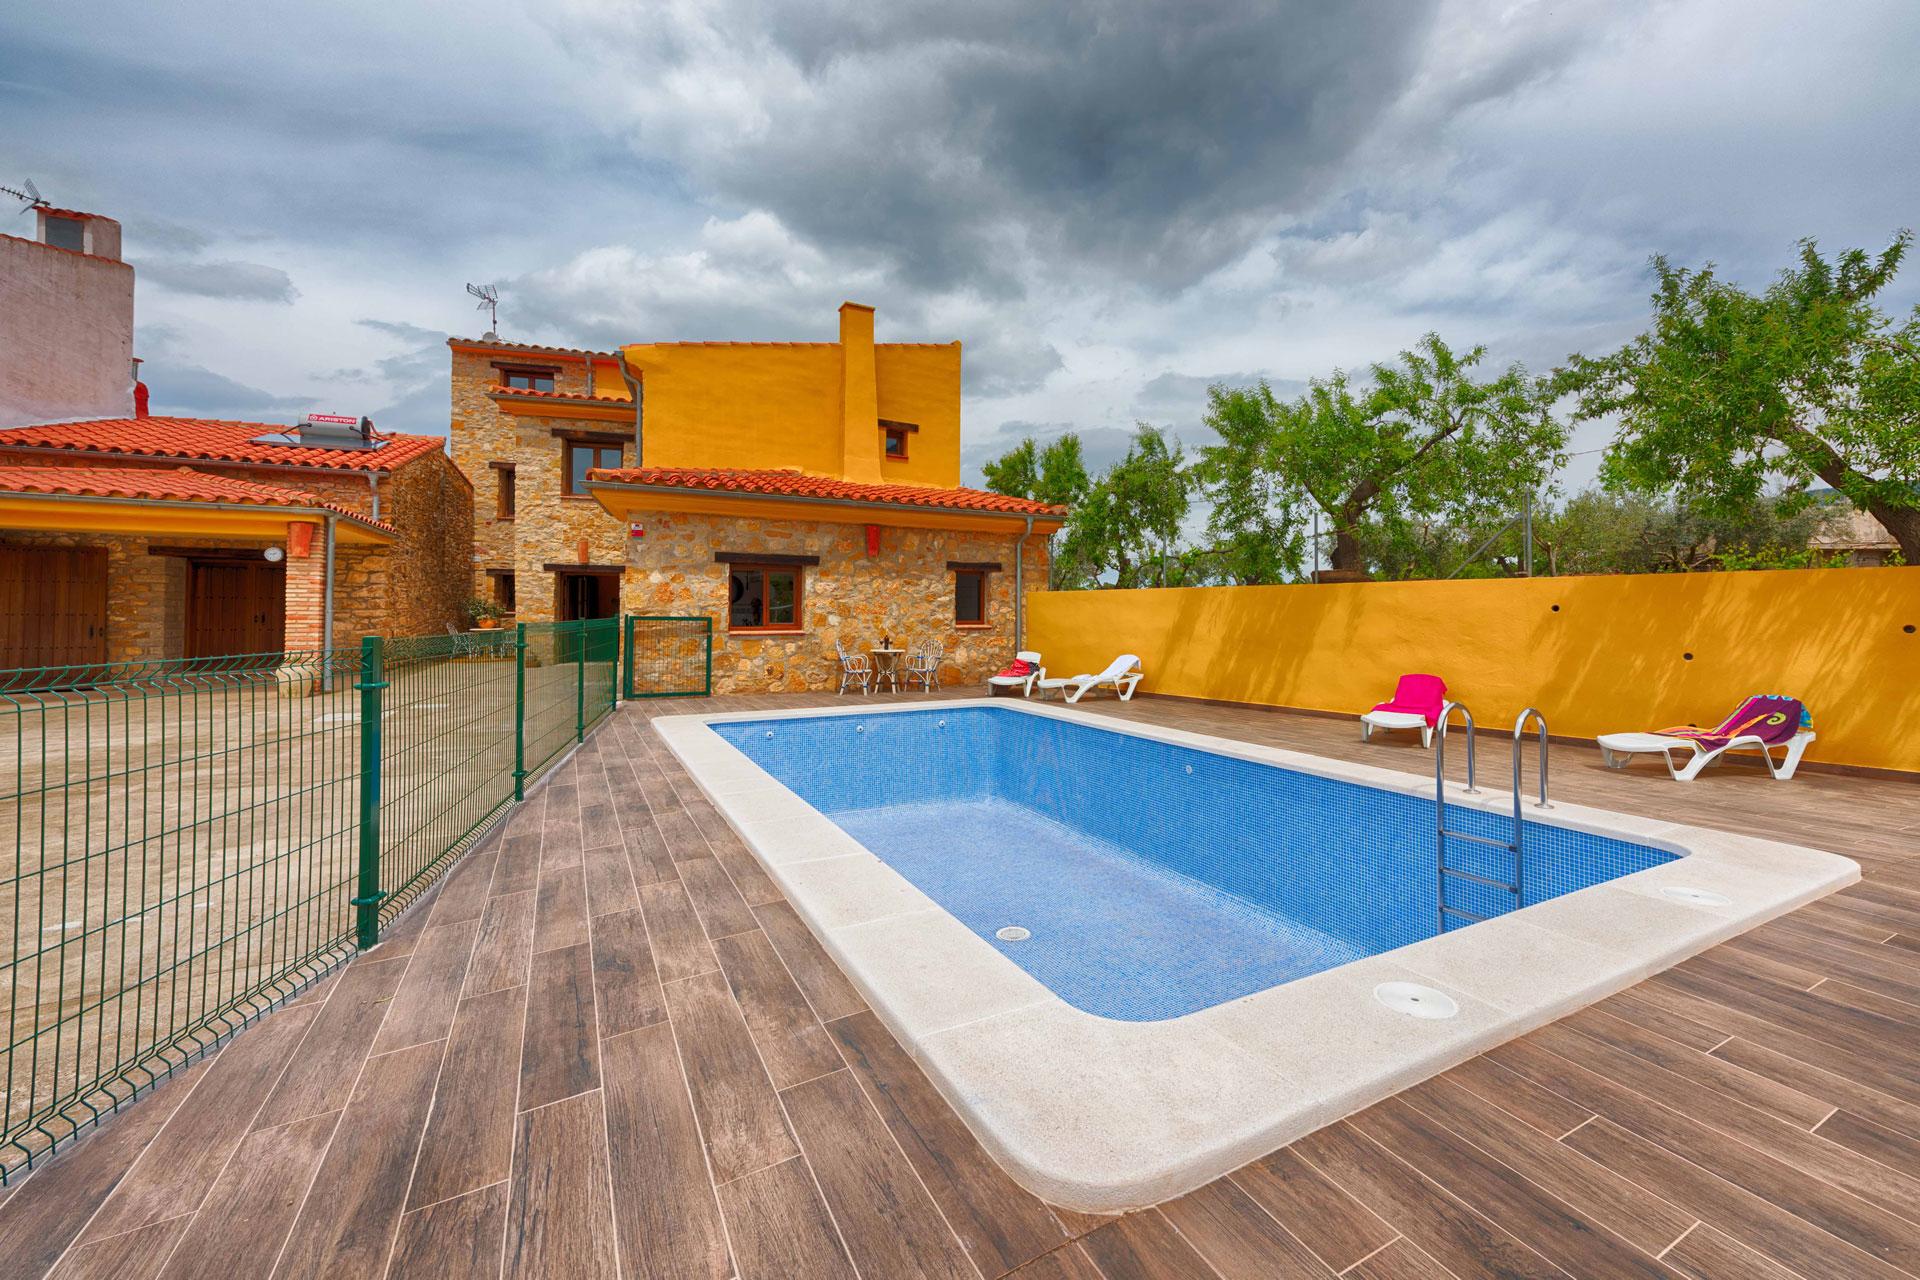 Casa rural en castell n casa rural priace for Casas vacacionales con piscina